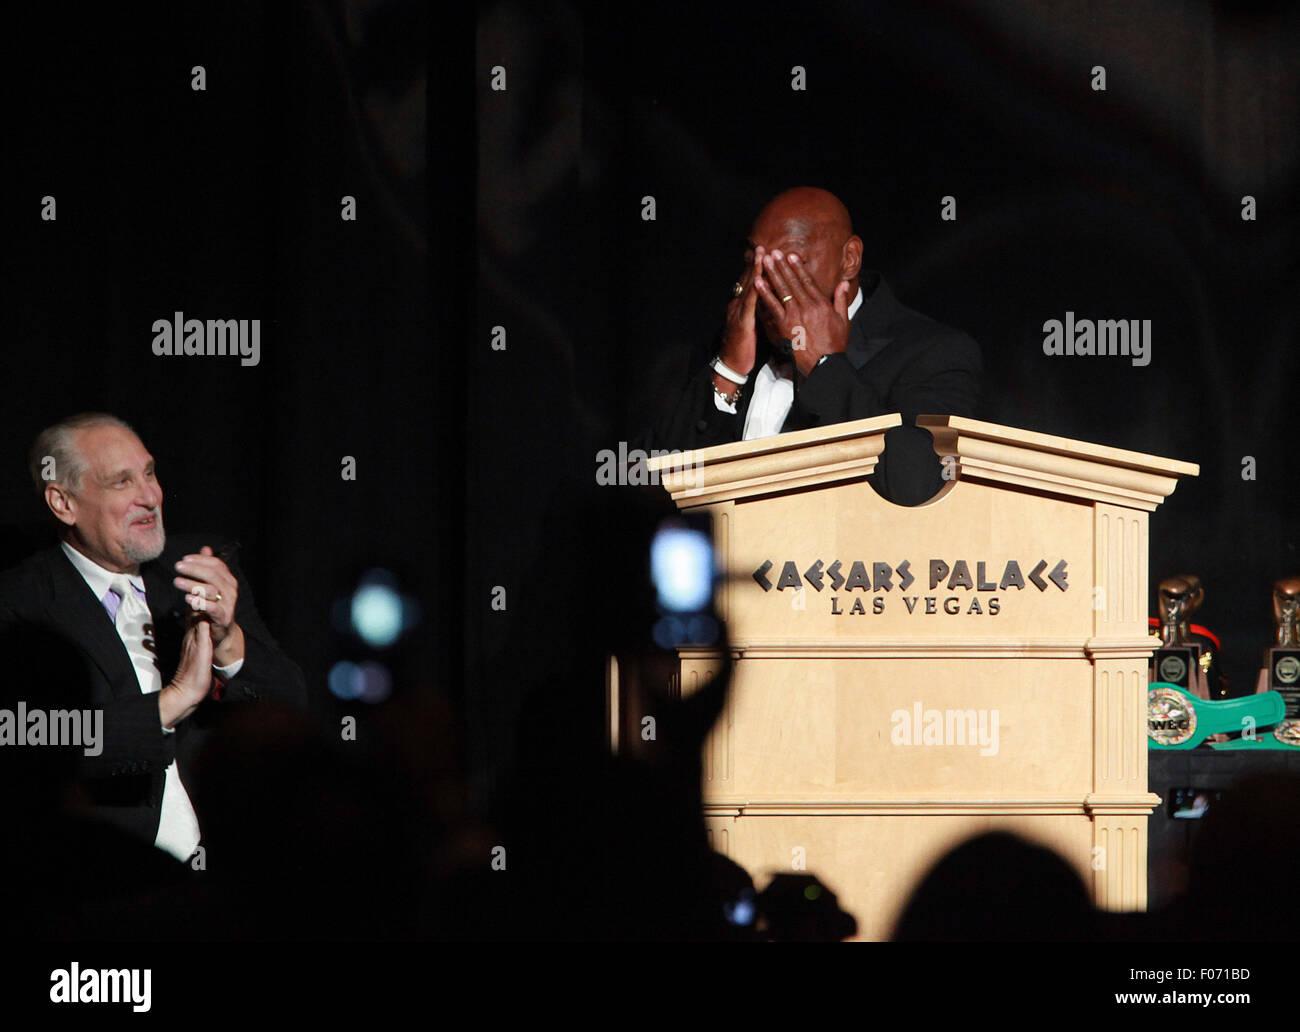 Las Vegas, Nevada, USA. 9th Aug, 2015. Former world boxing champion Marvin ''Marvelous'' Hagler - Stock Image